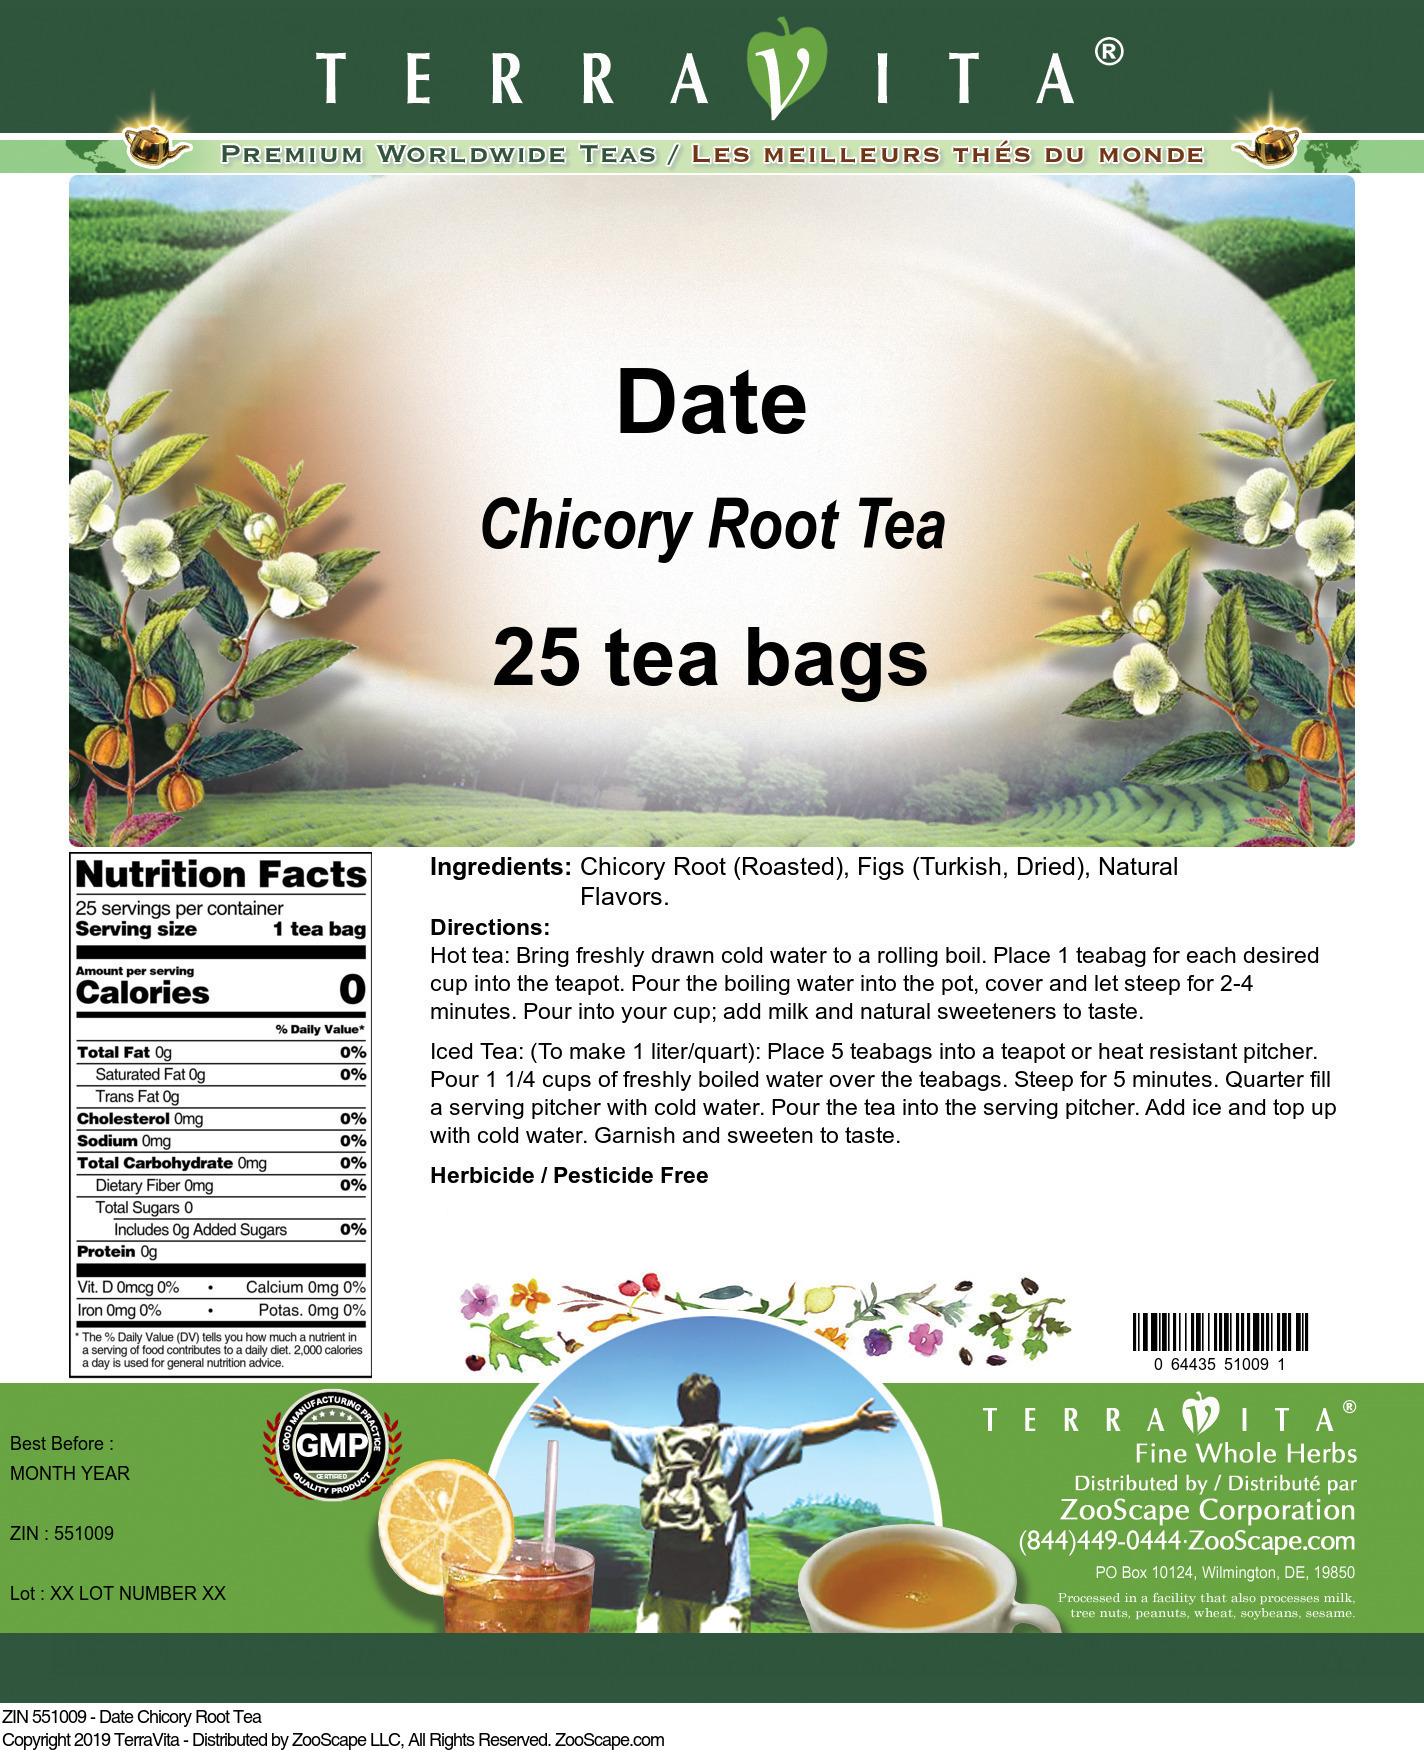 Date Chicory Root